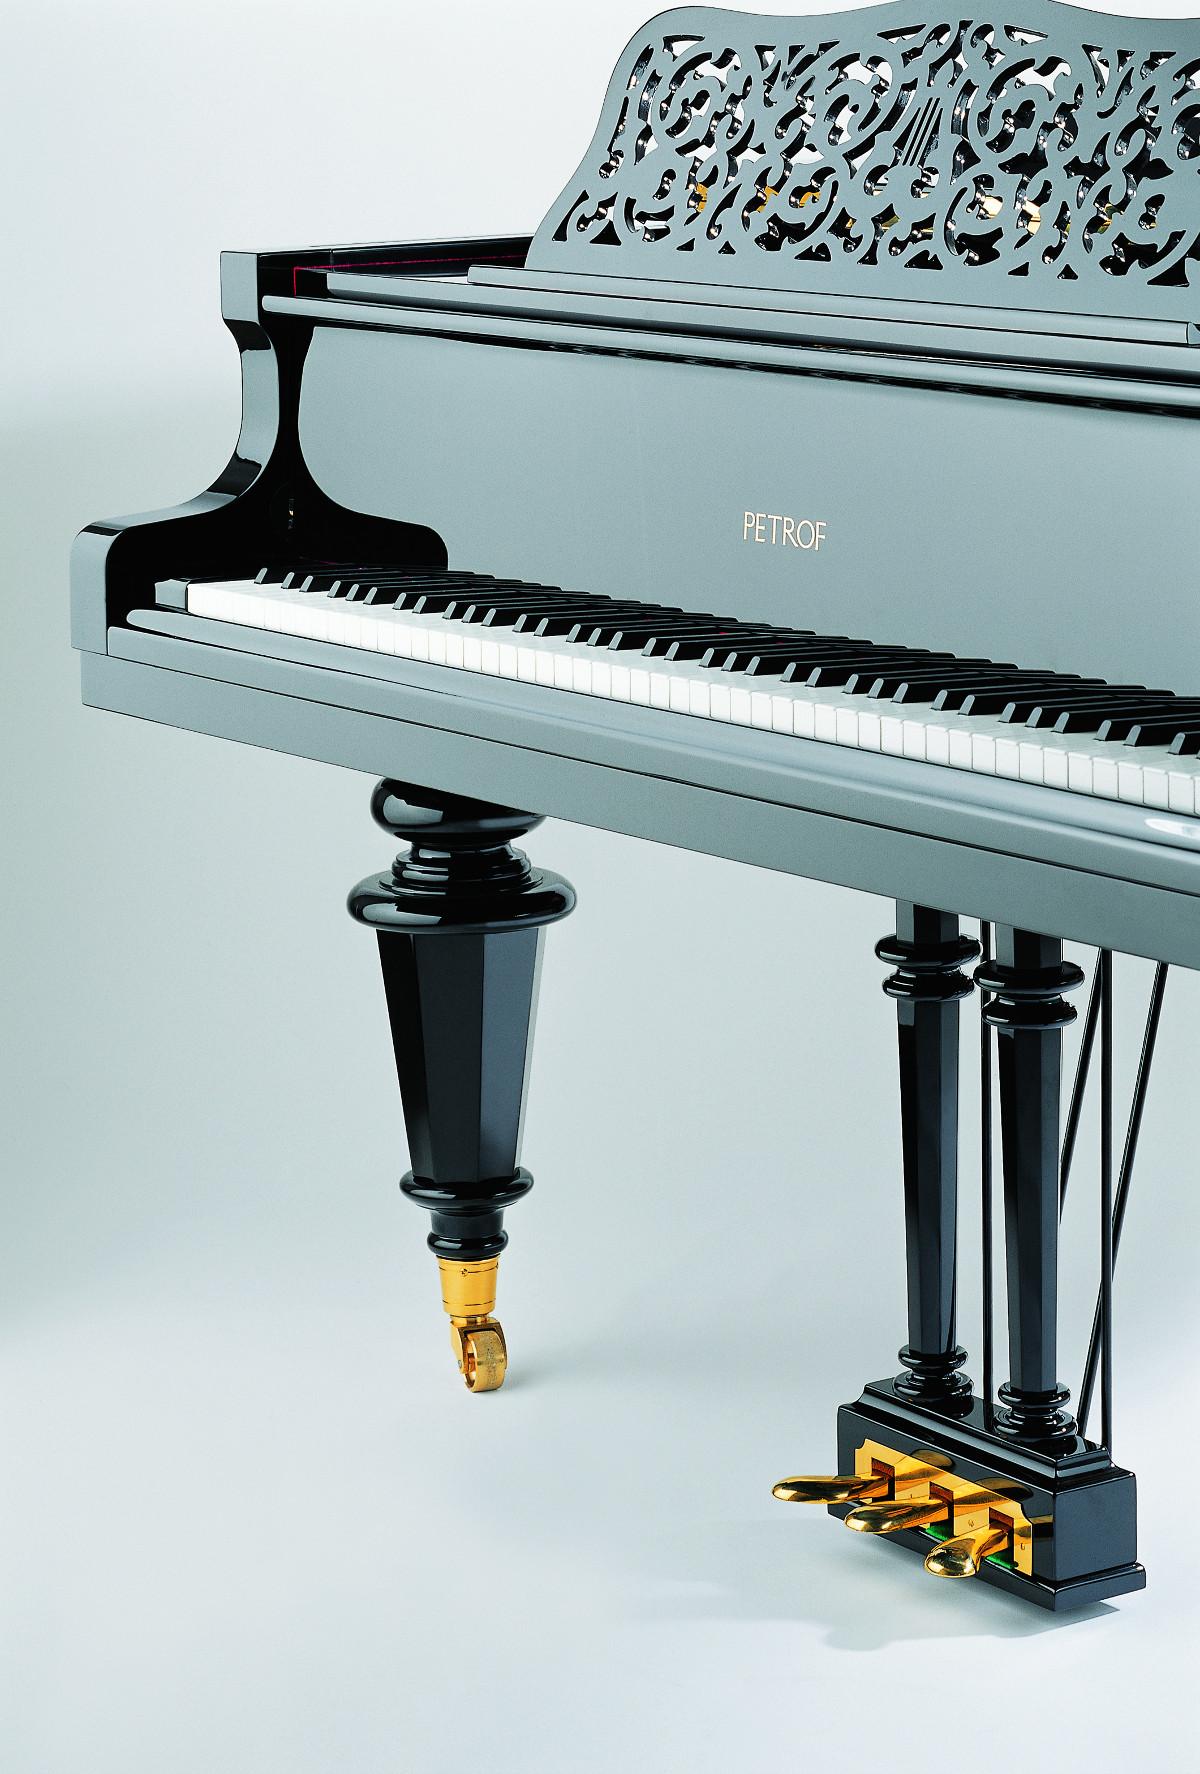 Grand piano P 173 Breeze Klasic | PETROF, spol. s r.o.